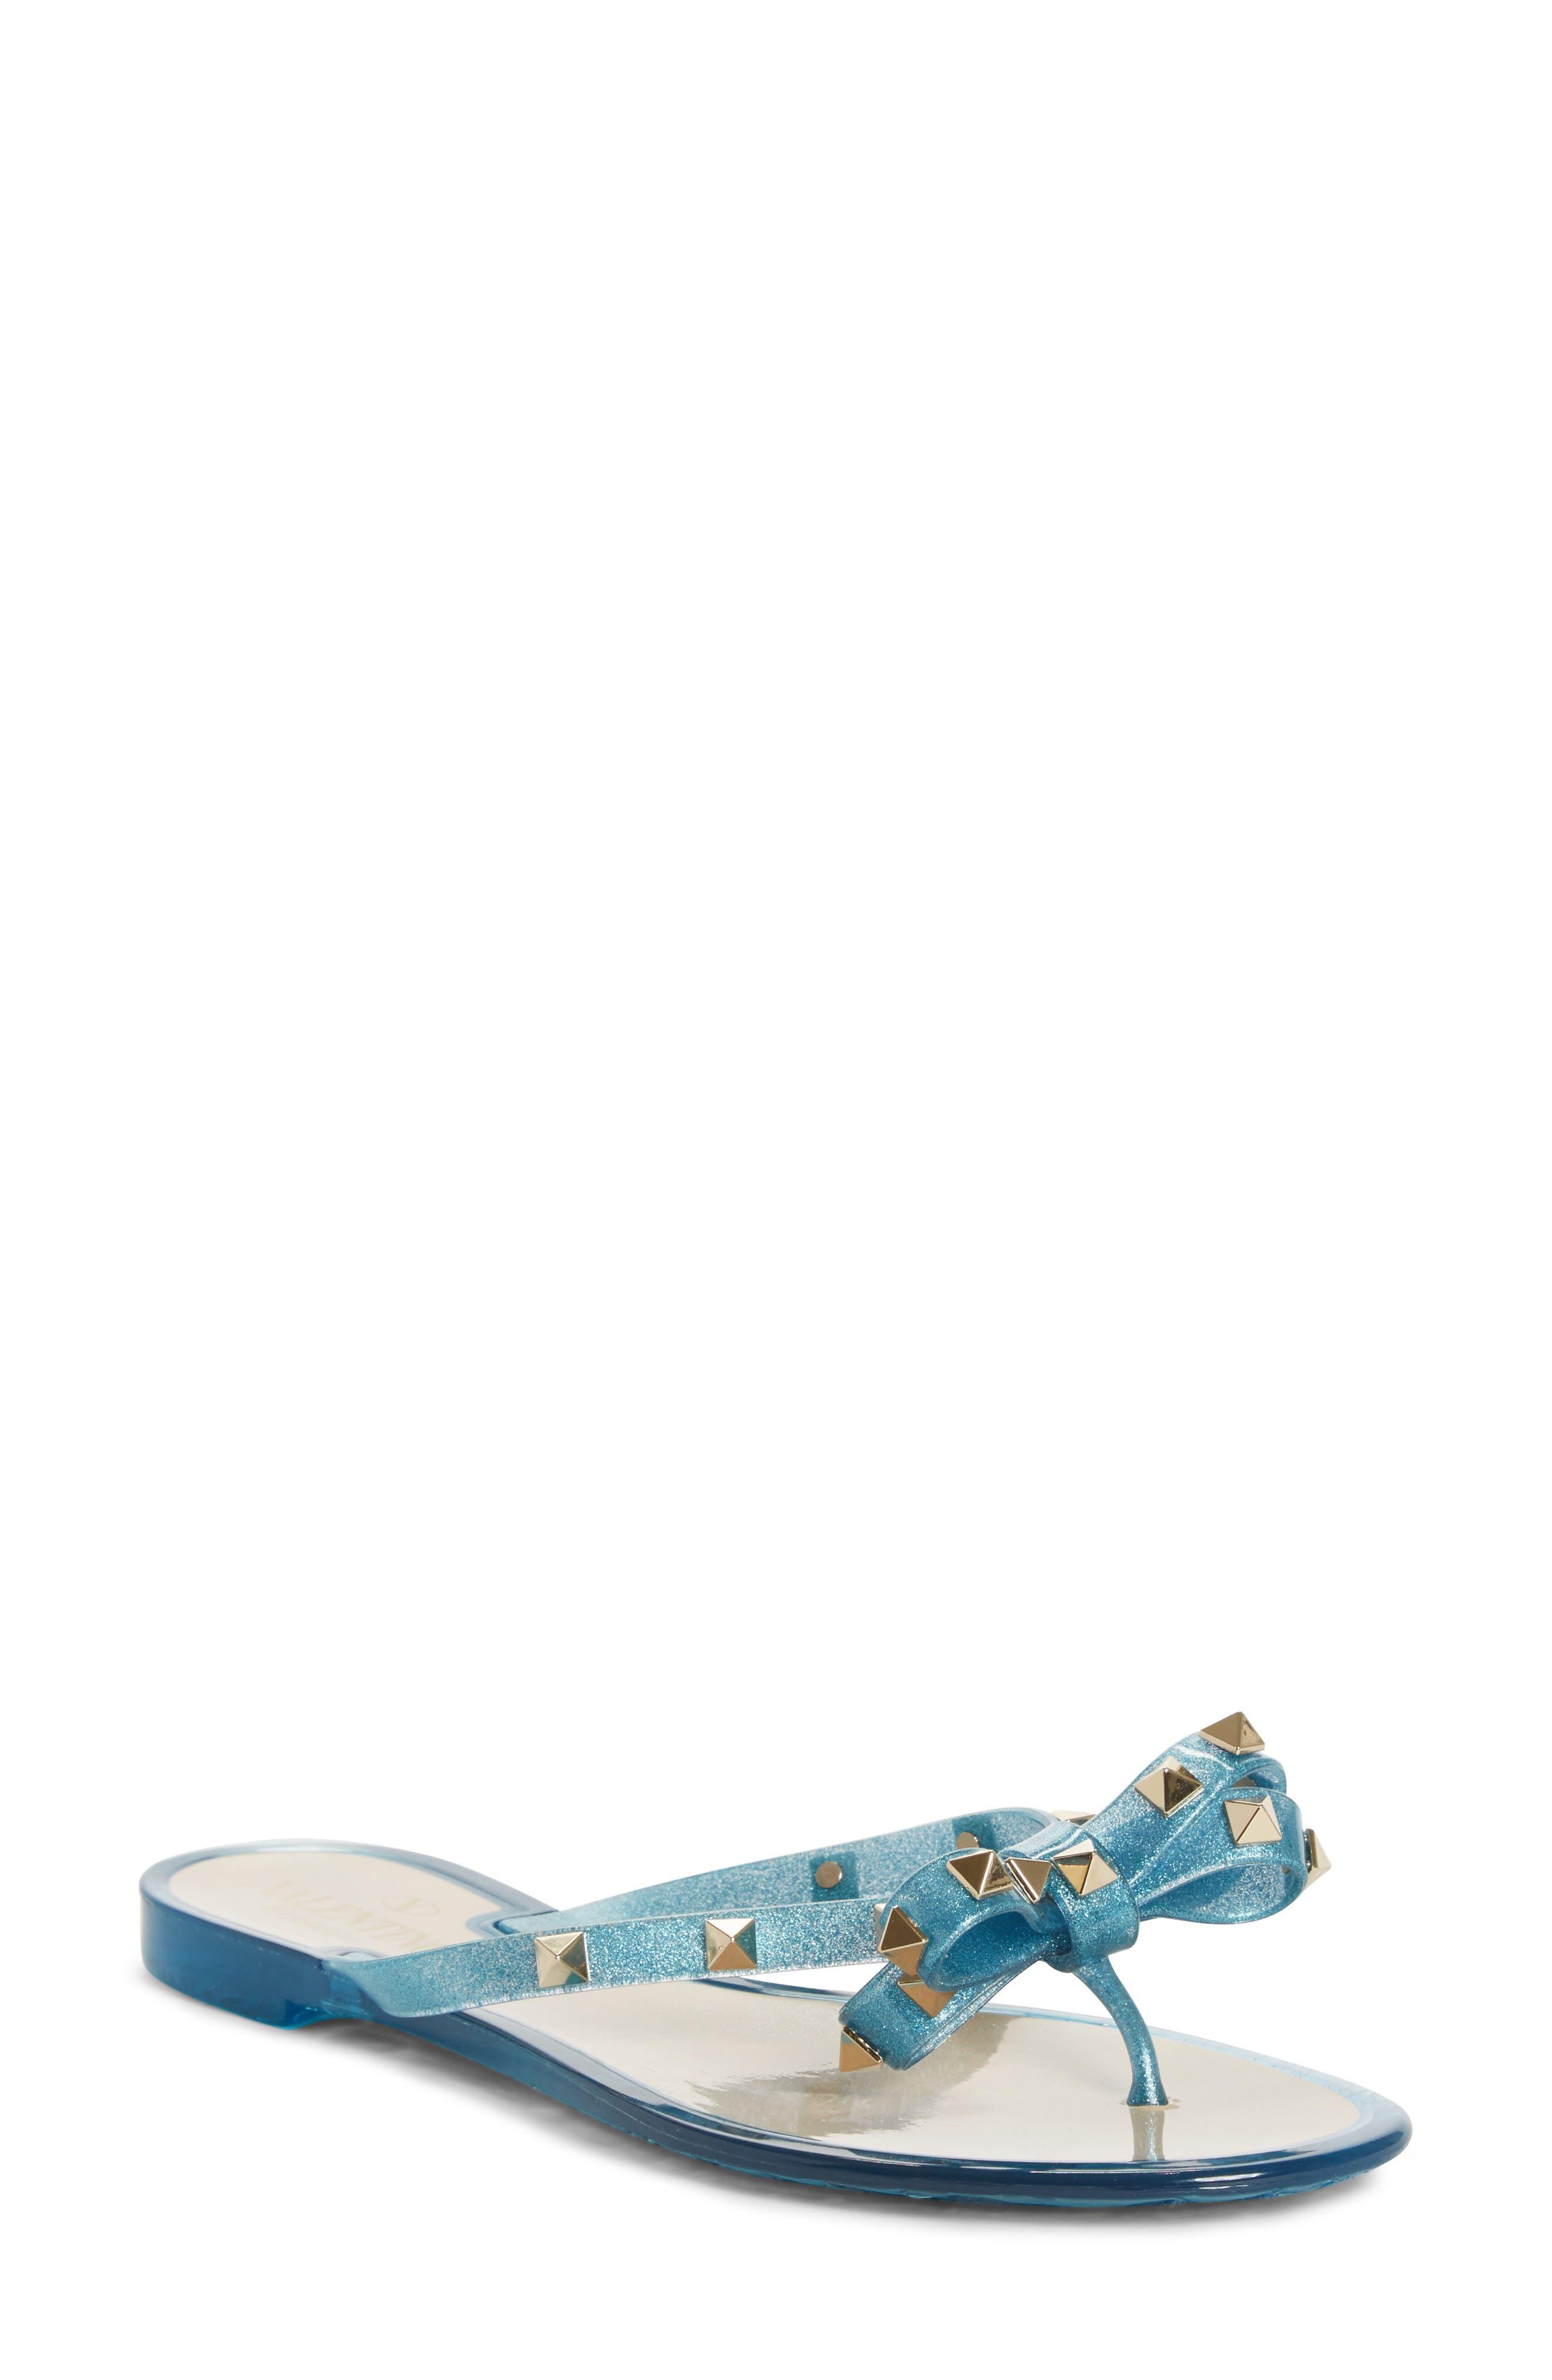 'Rockstud' Flip Flop,                         Main,                         color, 401